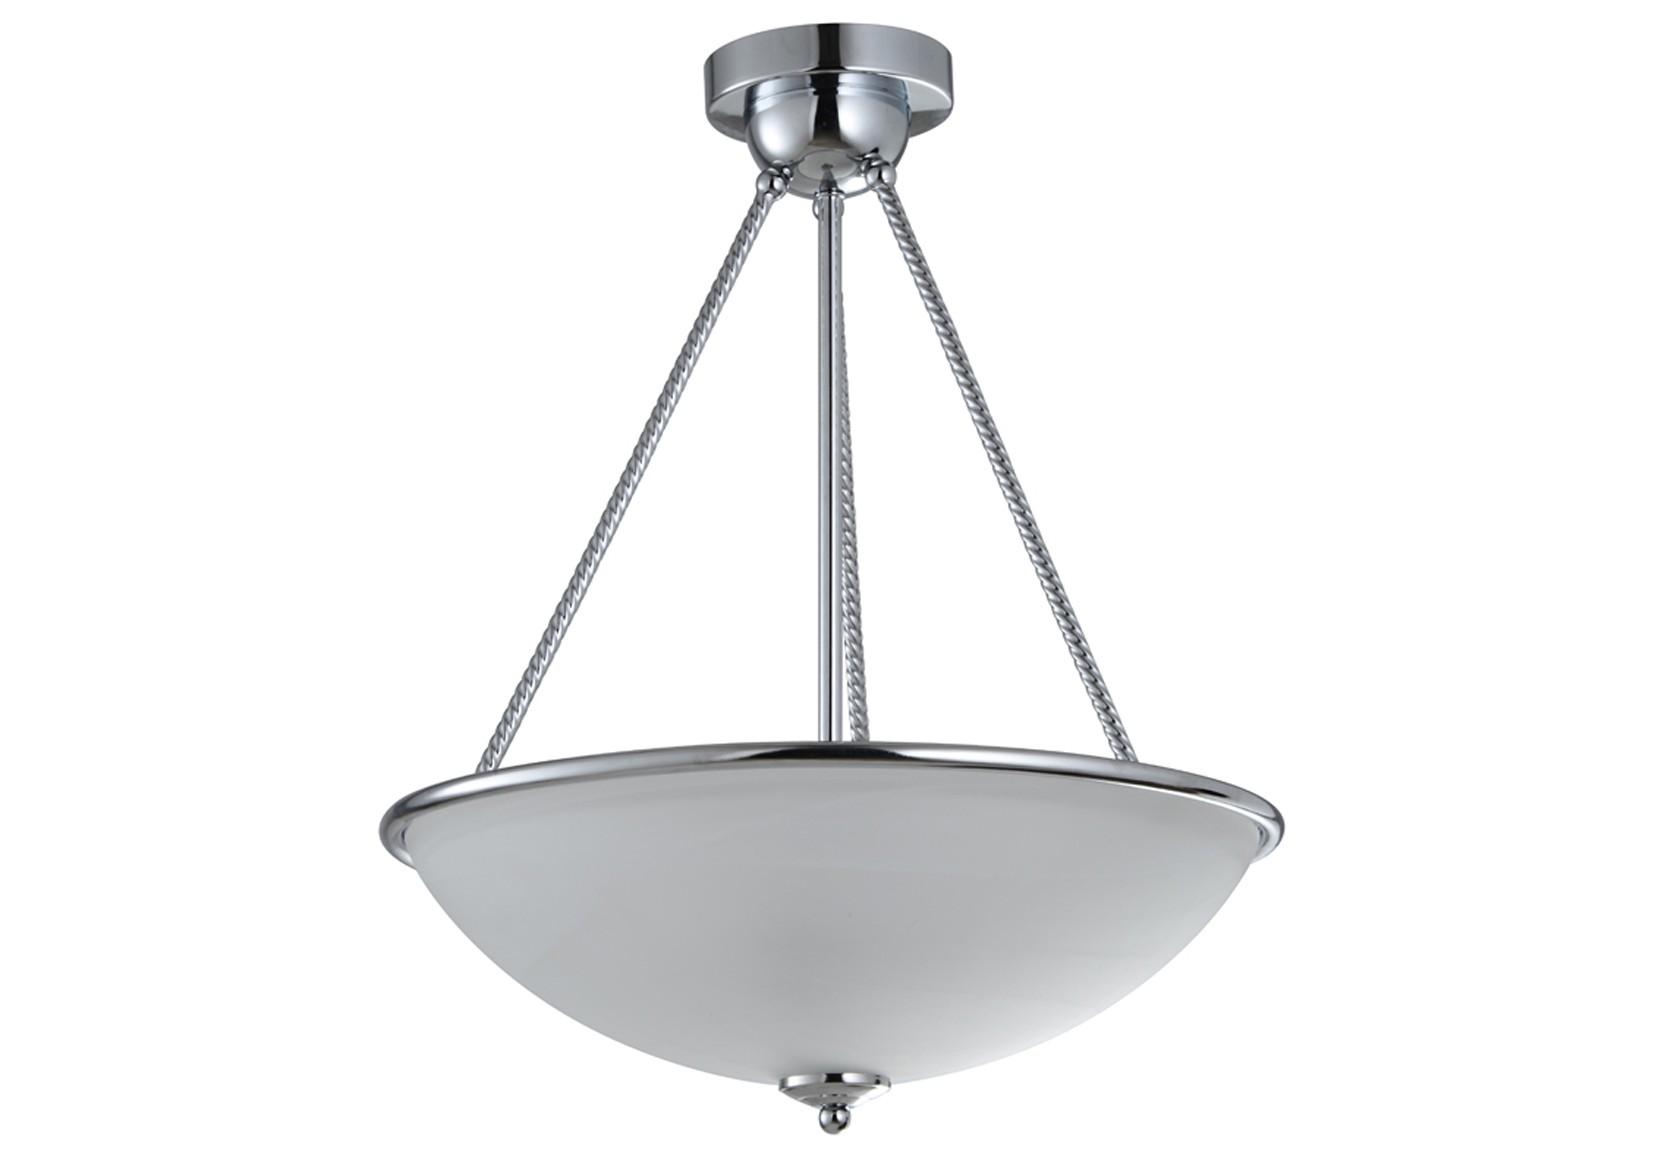 Подвесной светильник SESTOПодвесные светильники<br>&amp;lt;div&amp;gt;&amp;lt;span style=&amp;quot;line-height: 24.9999px;&amp;quot;&amp;gt;Цоколь: E27&amp;lt;/span&amp;gt;&amp;lt;br&amp;gt;&amp;lt;/div&amp;gt;&amp;lt;div&amp;gt;&amp;lt;div style=&amp;quot;line-height: 24.9999px;&amp;quot;&amp;gt;Мощность лампы: 60W&amp;lt;/div&amp;gt;&amp;lt;div style=&amp;quot;line-height: 24.9999px;&amp;quot;&amp;gt;Количество ламп: 3&amp;lt;/div&amp;gt;&amp;lt;/div&amp;gt;<br><br>Material: Стекло<br>Height см: 50<br>Diameter см: 40